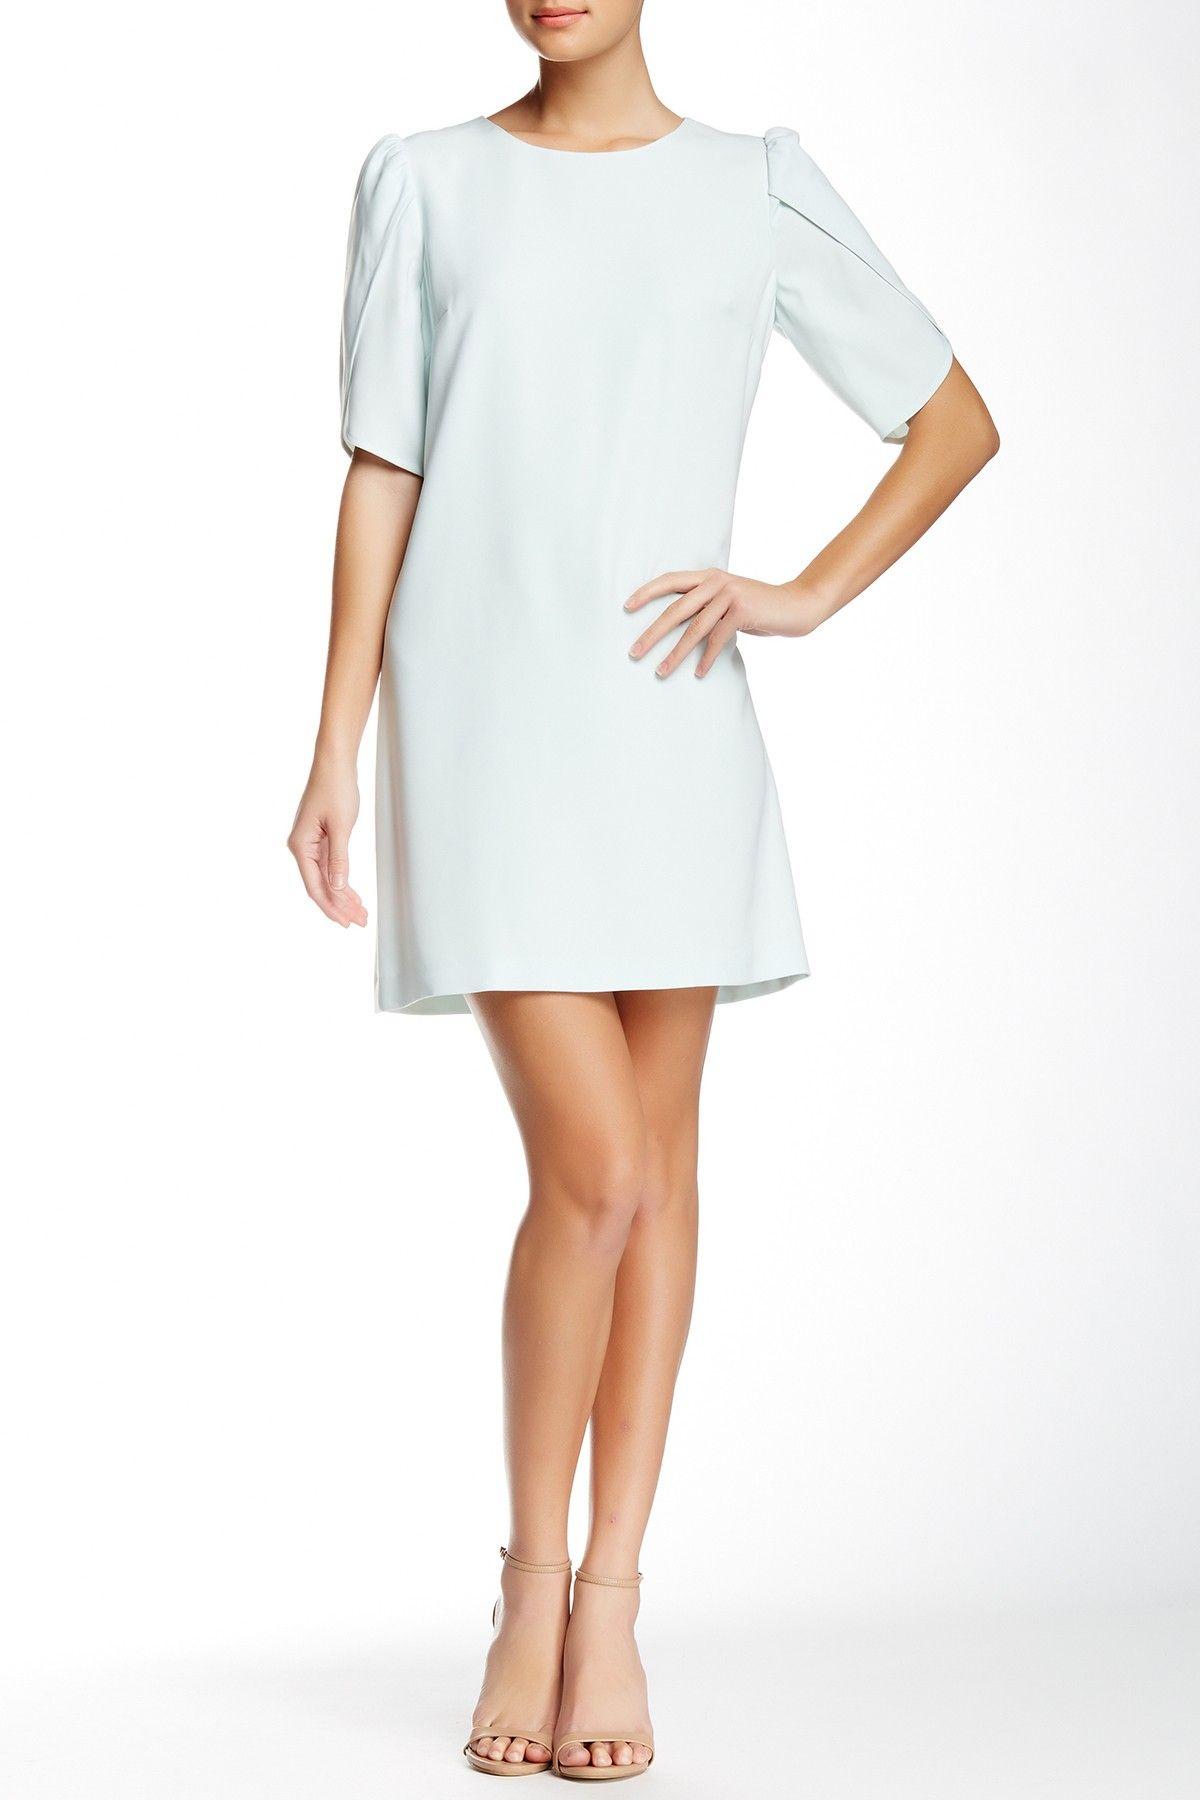 Sunday Crew Neck Wrap Sleeve Dress by Cynthia Steffe on @HauteLook